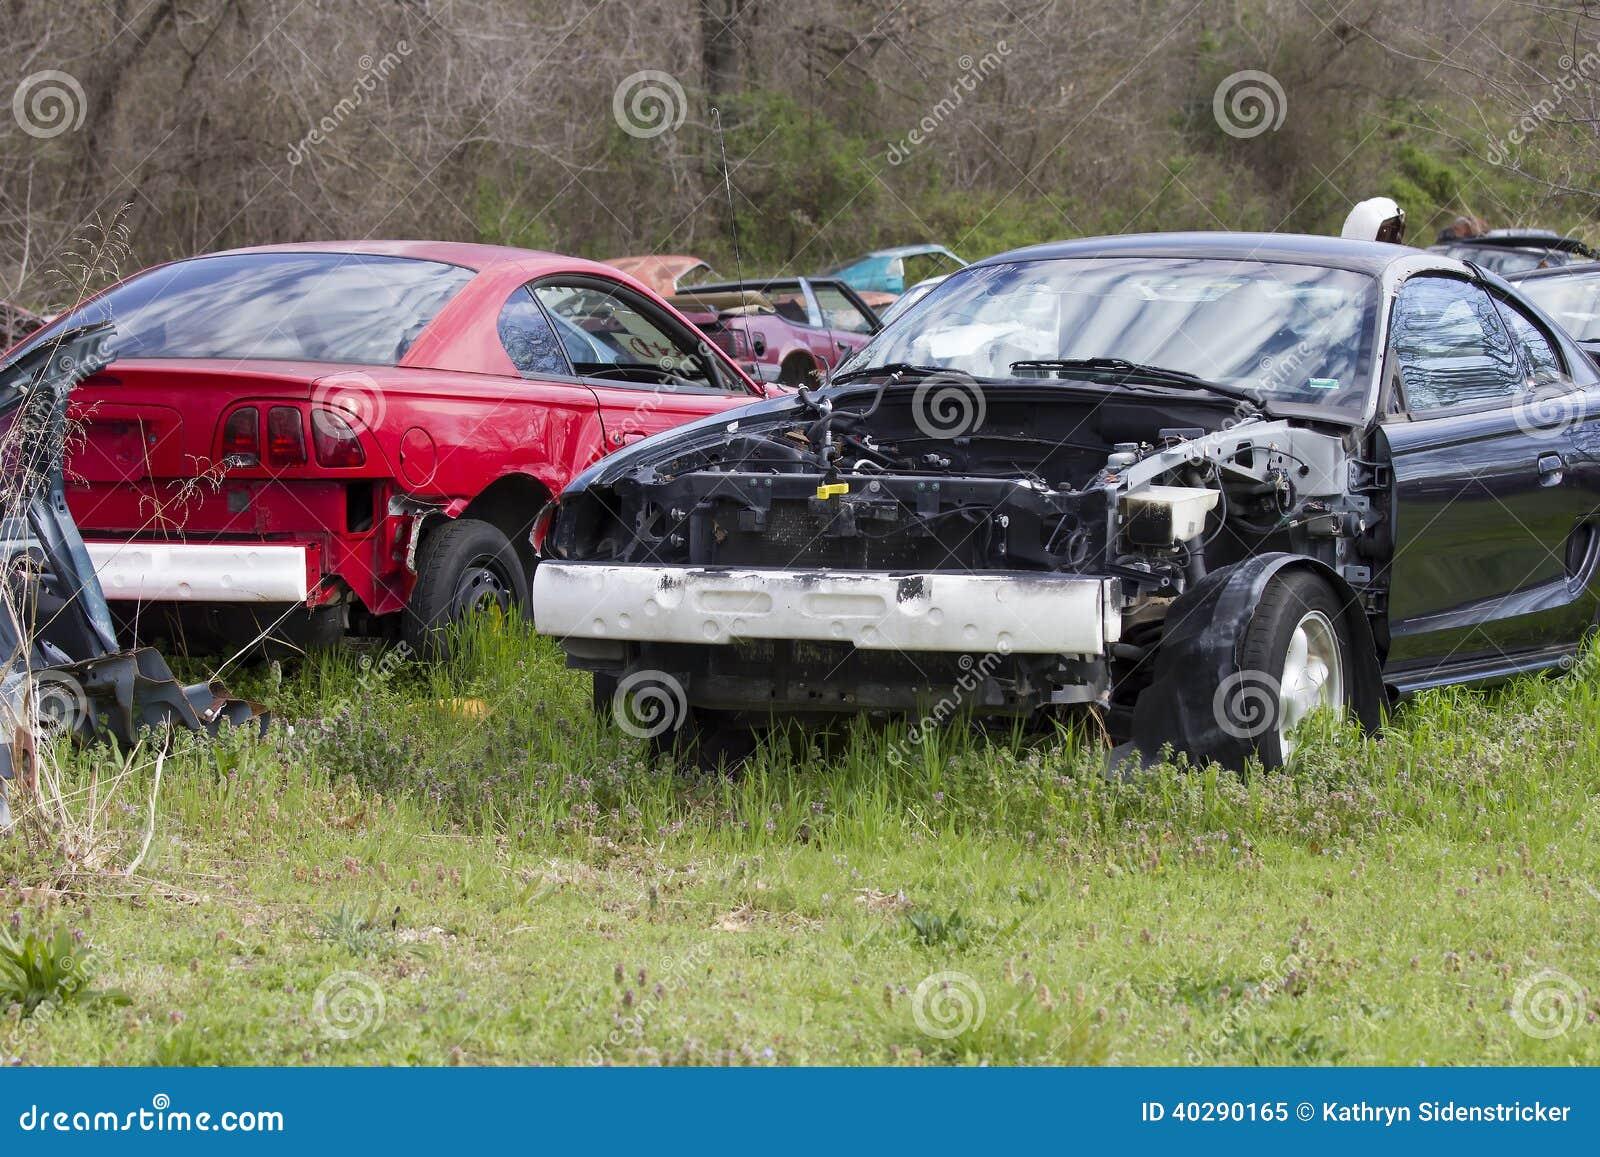 Auto Salvage Yard 1994 1998 Mustangs Stock Image Image